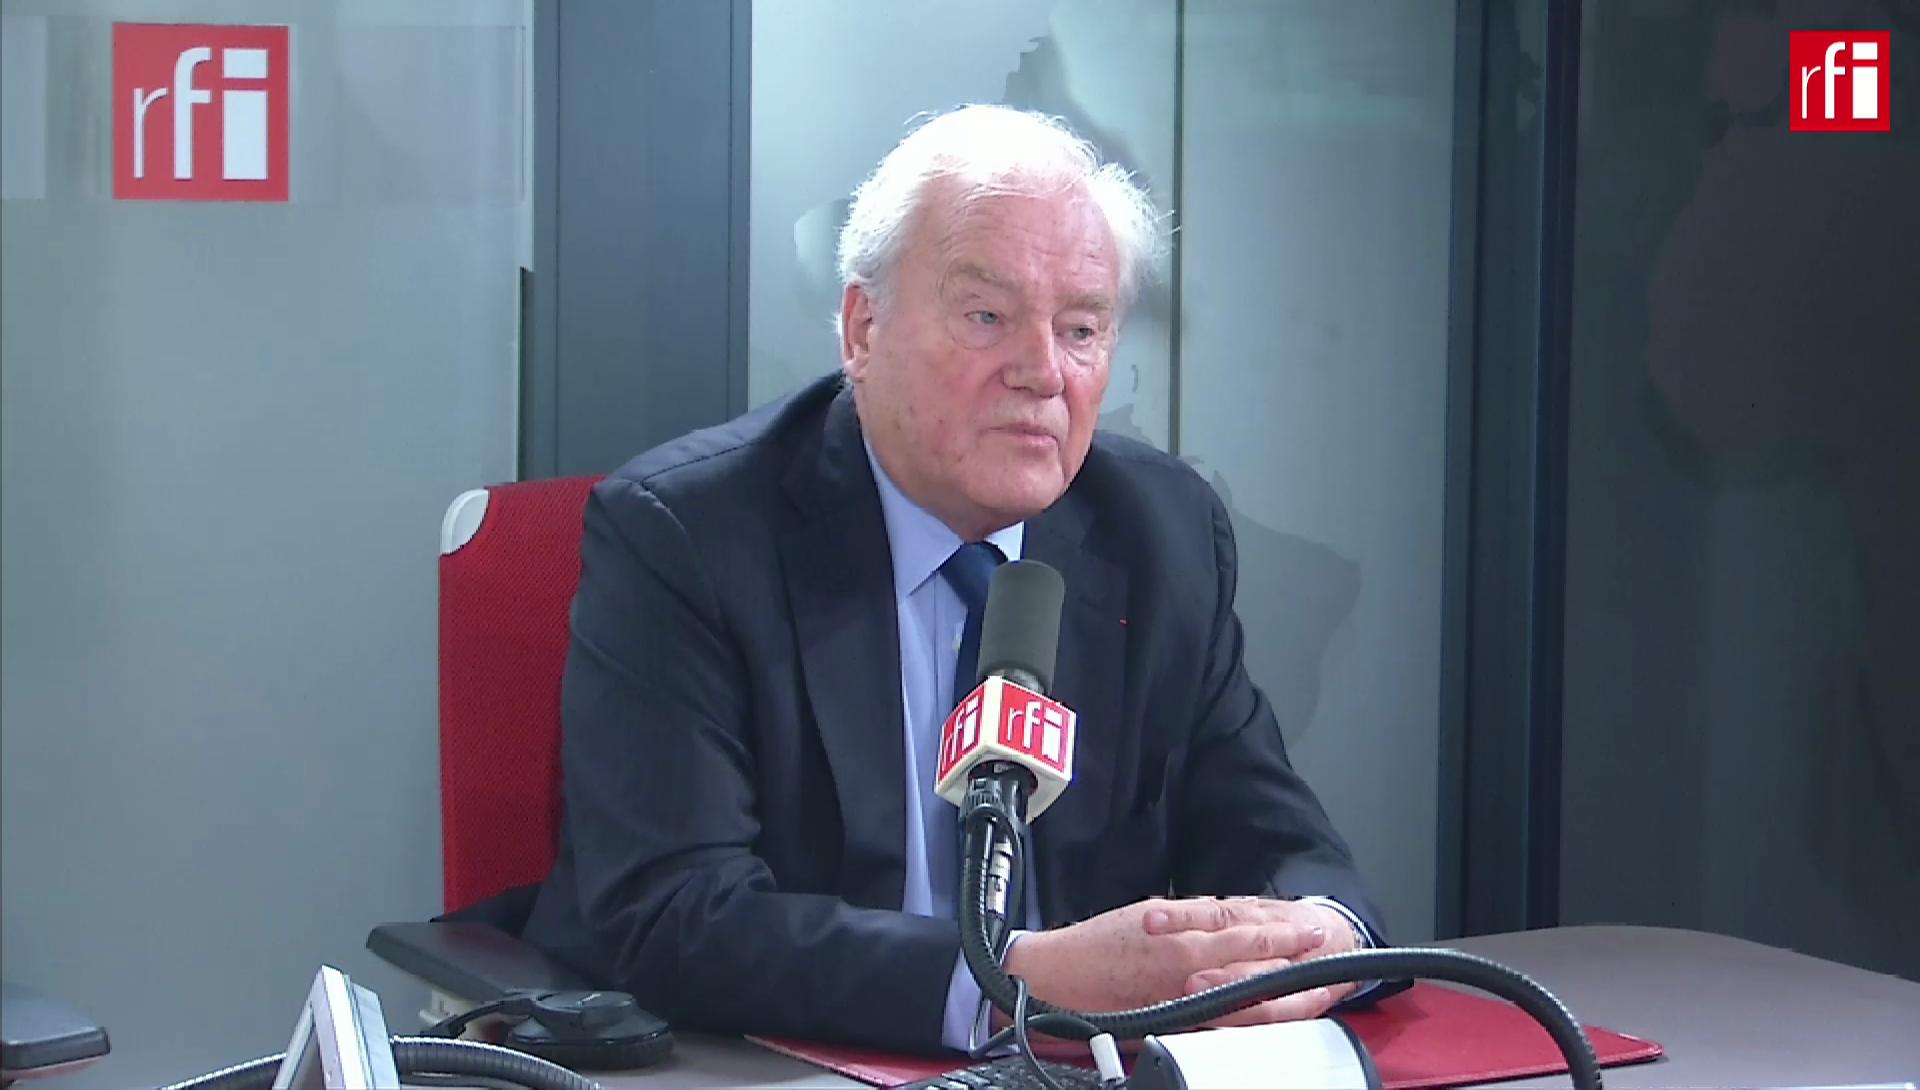 Christian Cambon sur RFI le 27 novembre 2019.